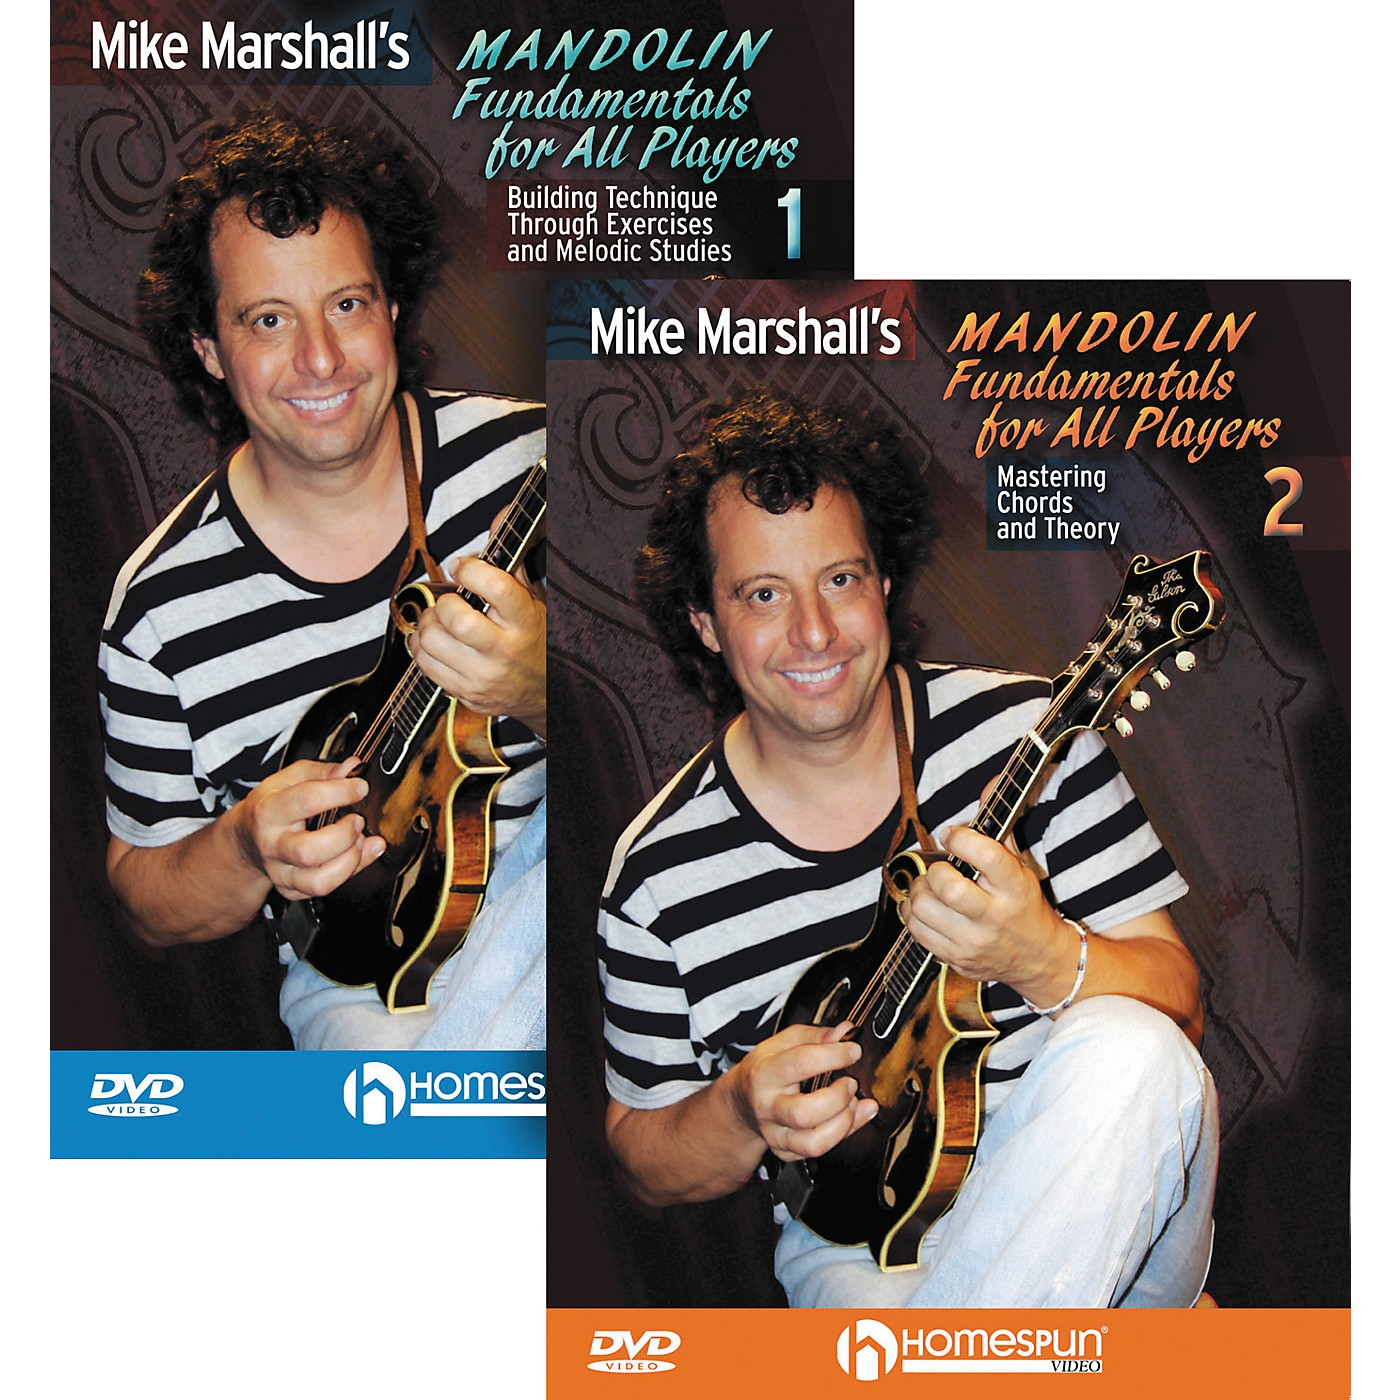 Homespun Mike Marshall's Mandolin Fundamentals for All Players (DVD) 1&2 thumbnail